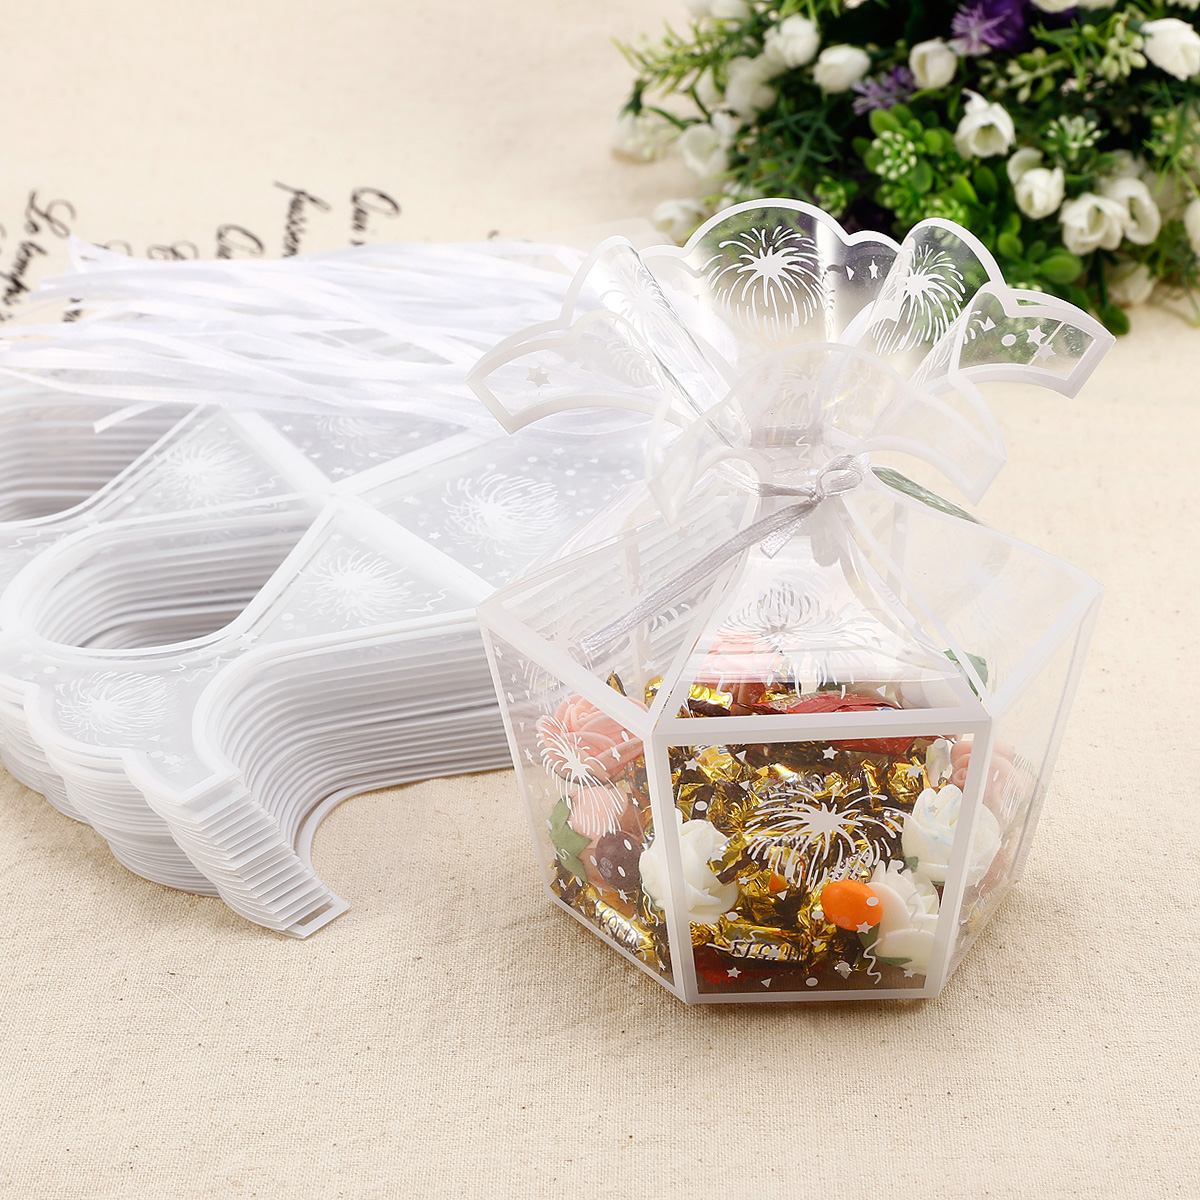 Wedding Favor Boxes Clear Plastic: Pcs clear plastic tuck top pvc ...